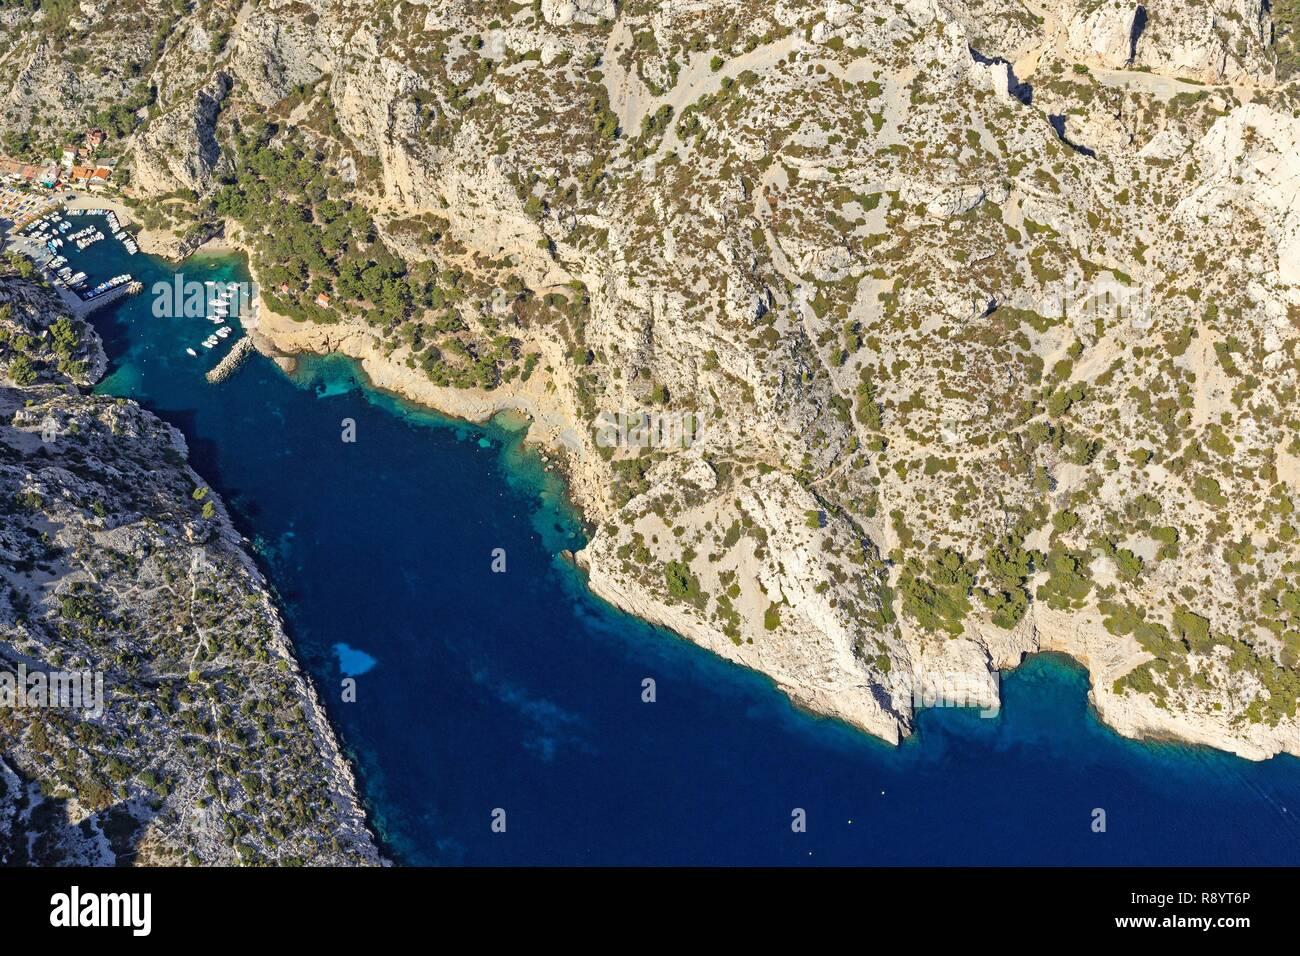 France, Bouches du Rhone, Calanques National Park, Marseille, 9th arrondissement, cove of Morgiou (aerial view) Stock Photo